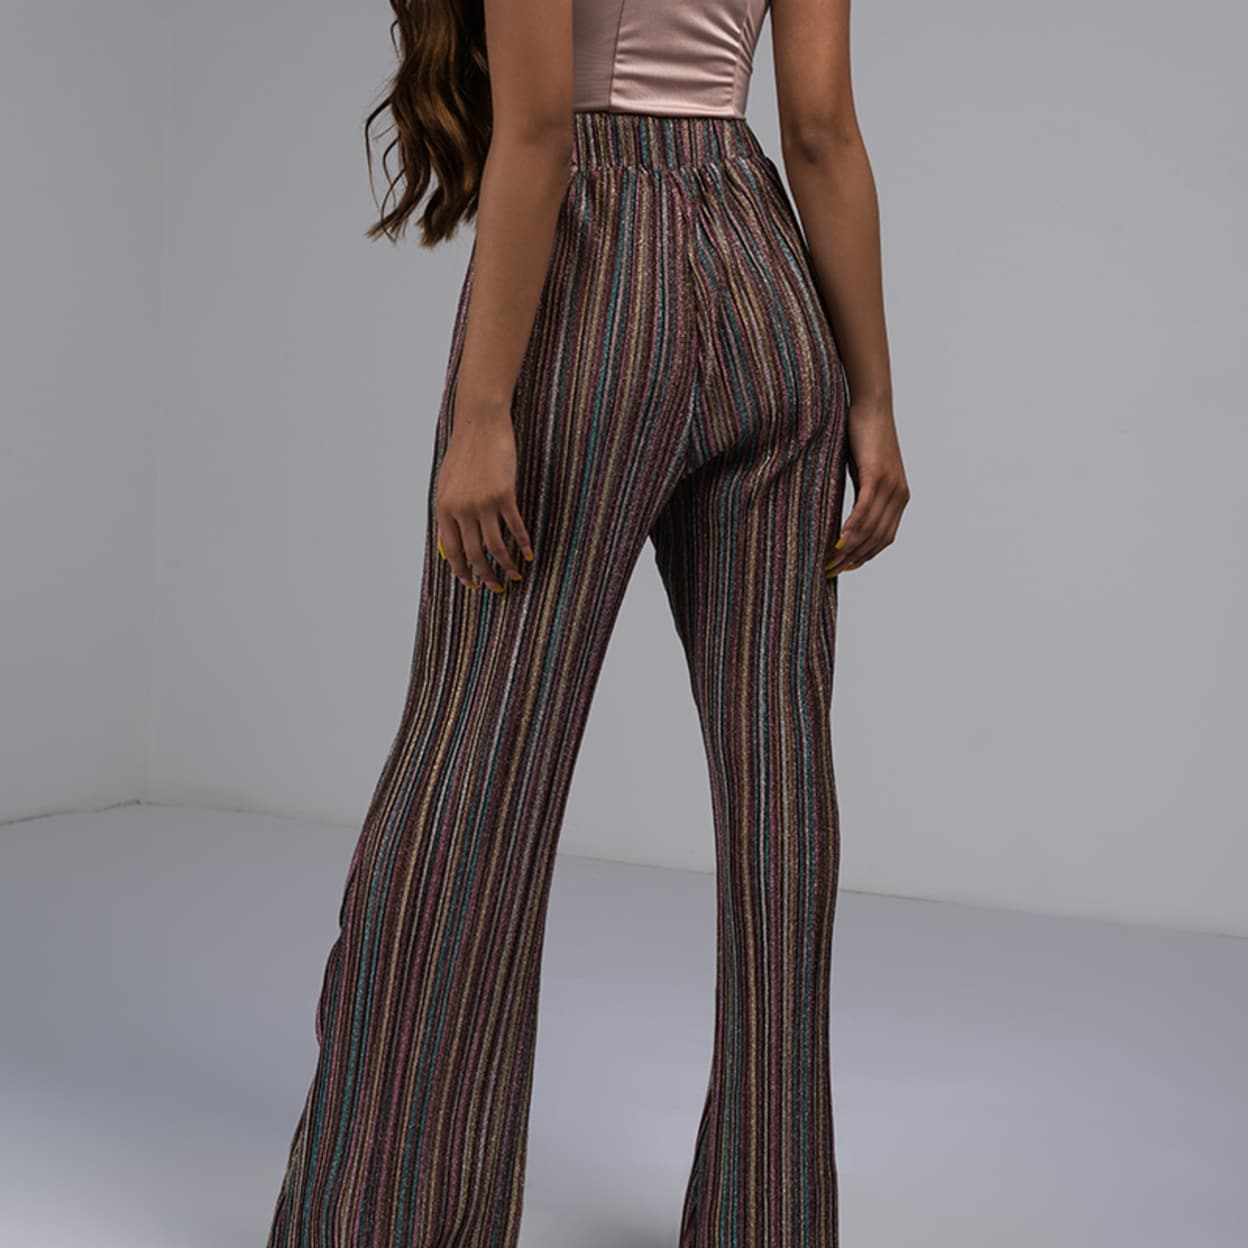 640b3934 Shop Akira Women'S Rainbow Glitter Sheer Stripe Wide Leg Flare High Waist  Stretch Trouser Pant - Free Shipping Today - Overstock - 26968508